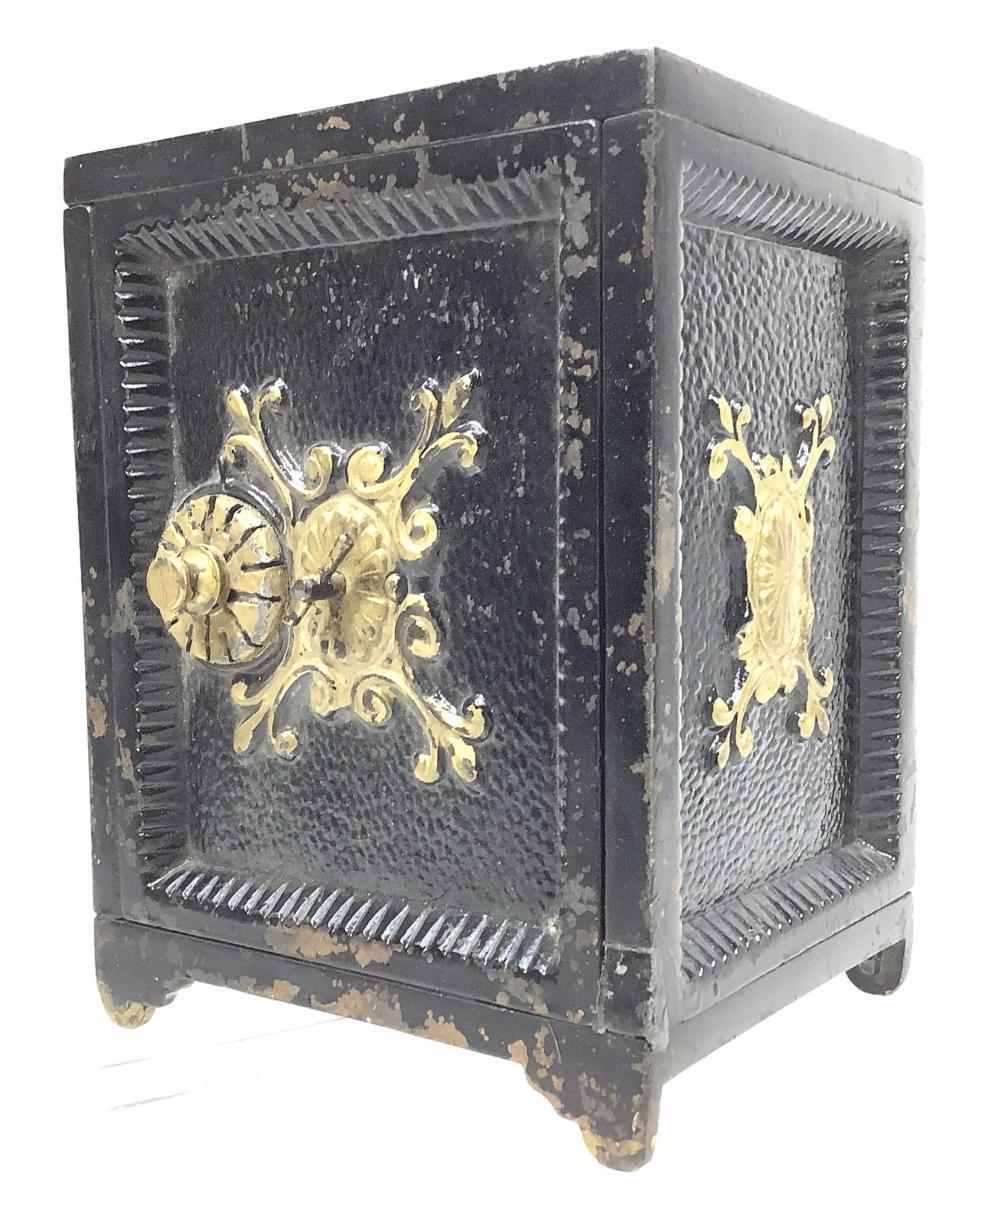 The Cast Iron Bank Safe Deposit Box